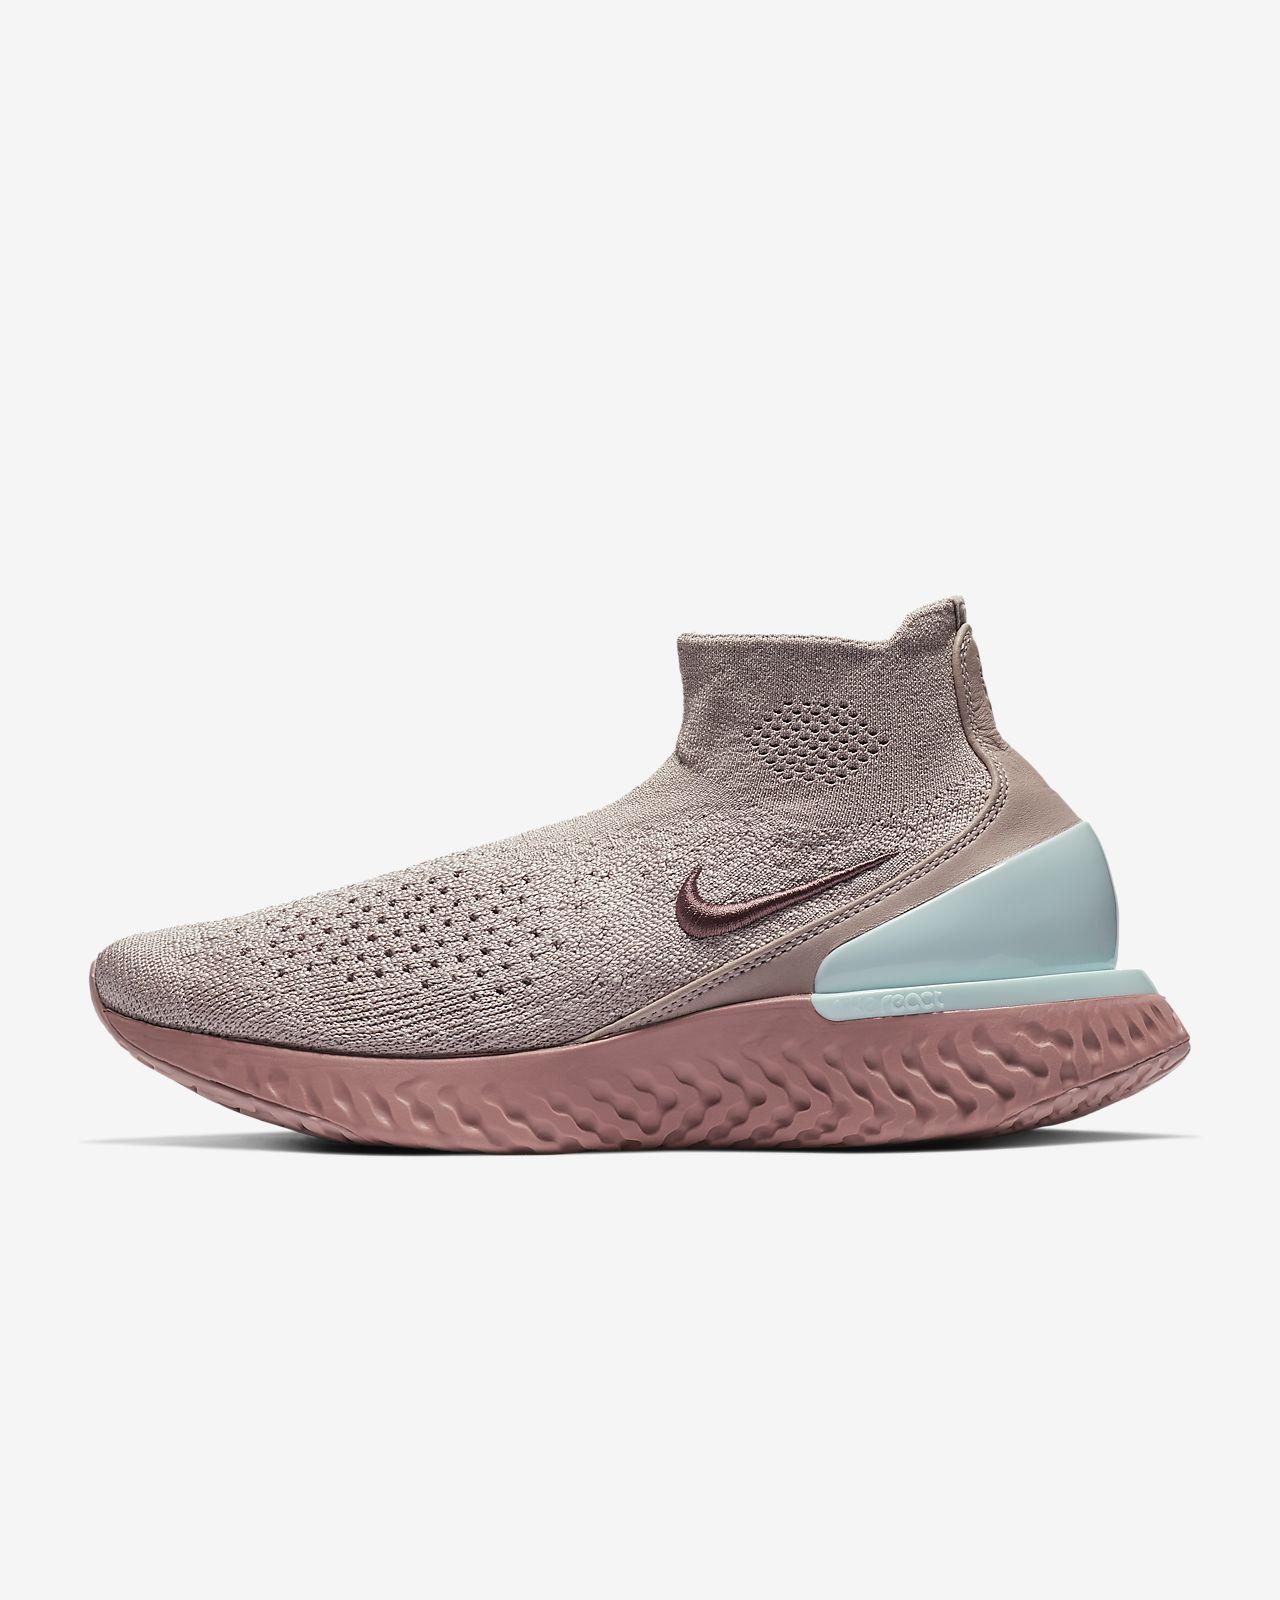 Damskie buty do biegania Nike Rise React Flyknit